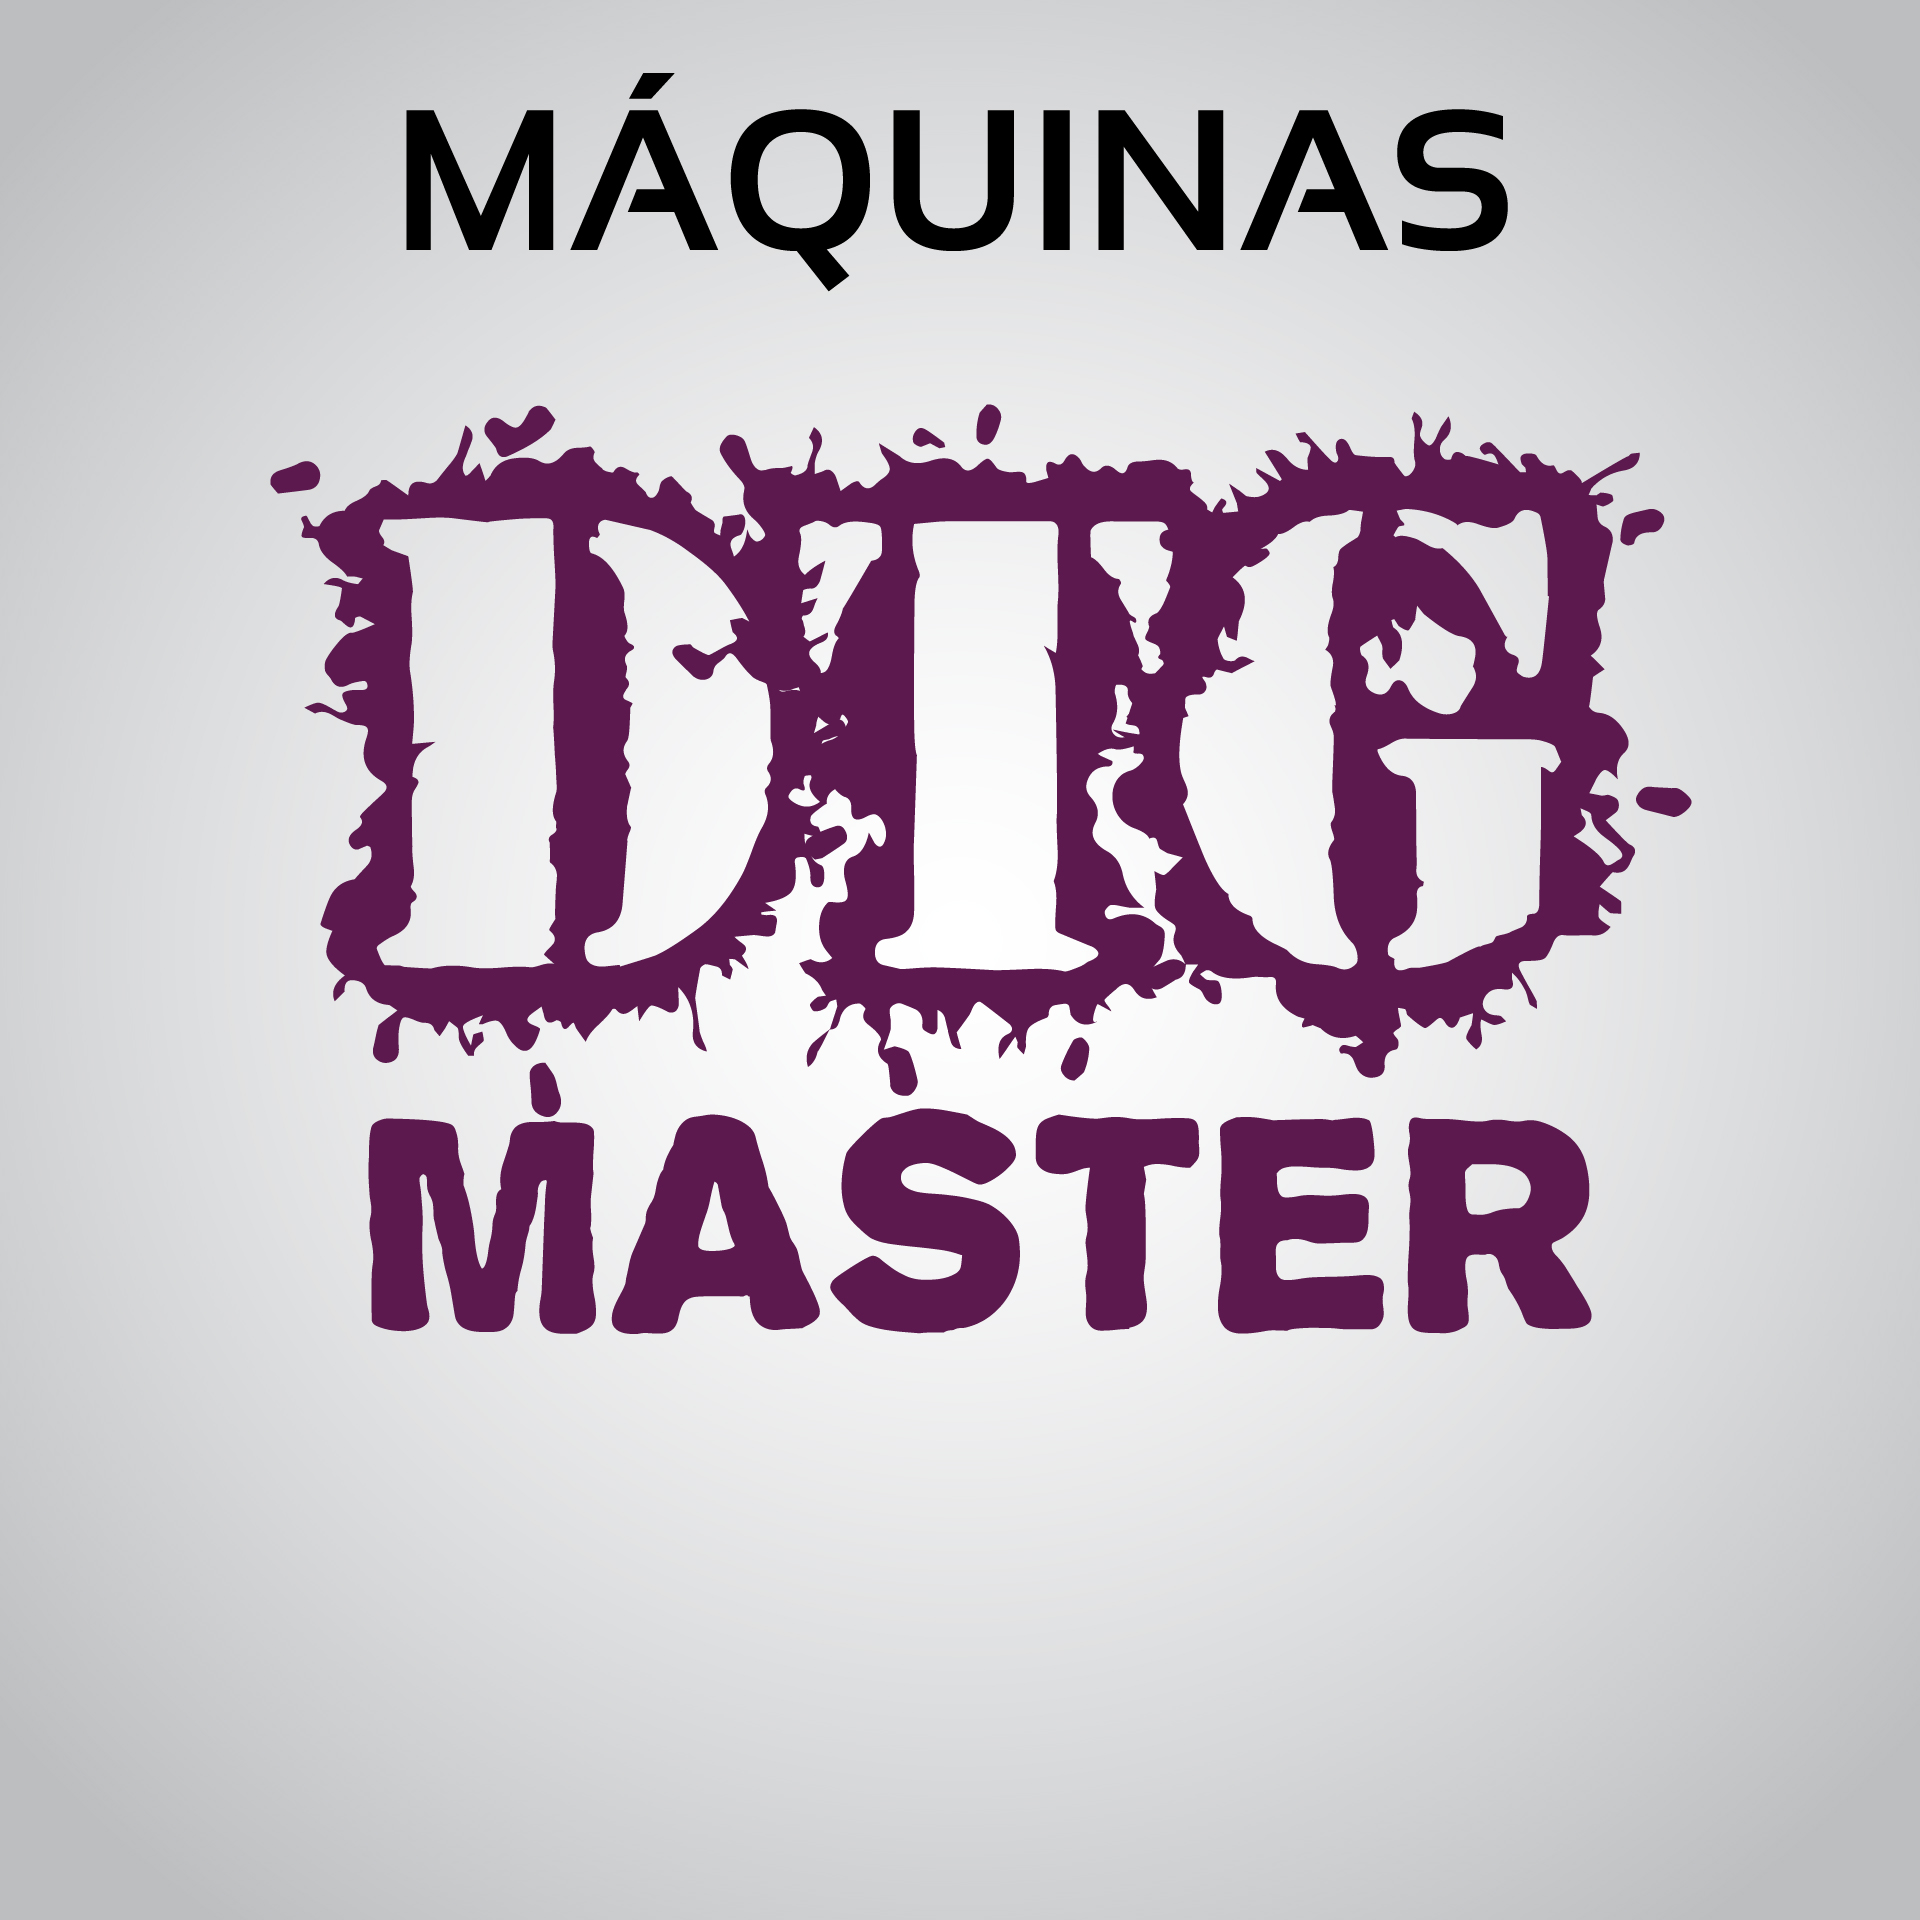 dtg-master-01